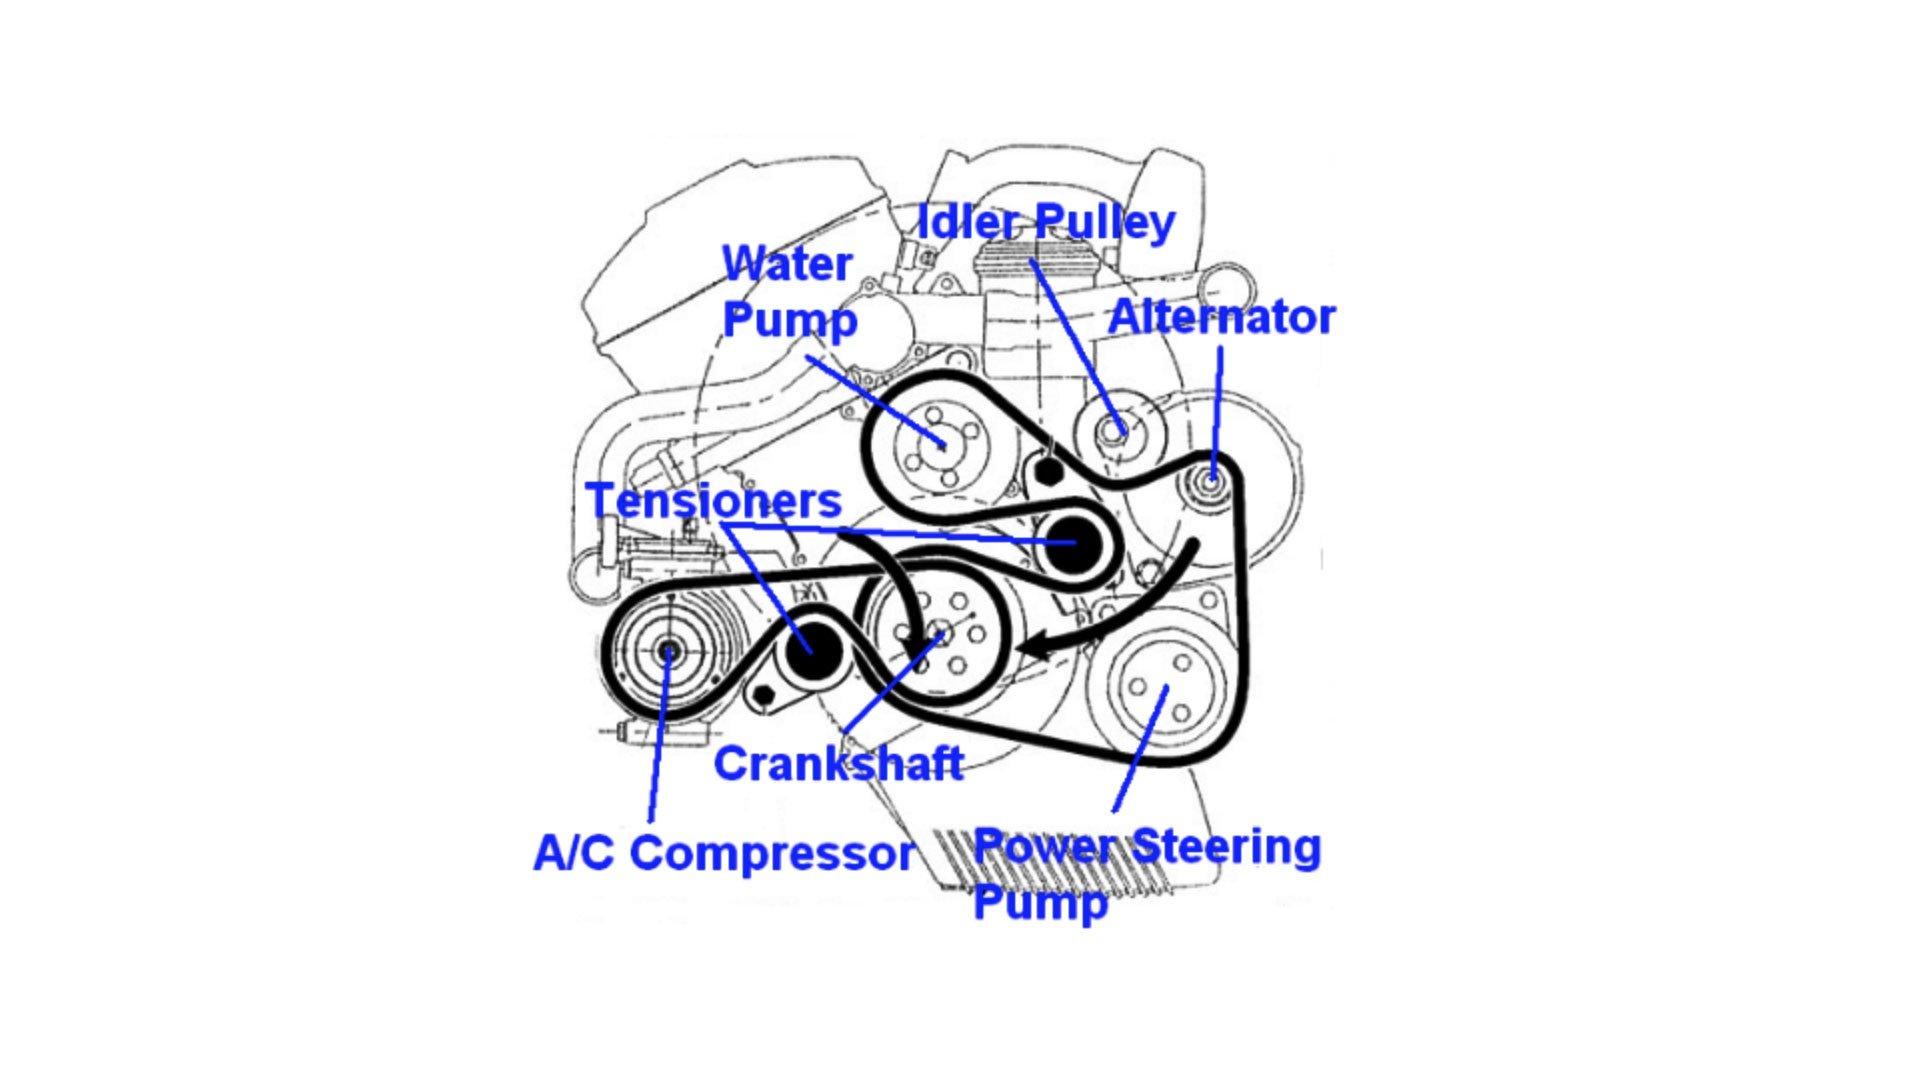 Bmw 530i Engine Diagram Together With Bmw E46 Cooling System Diagram